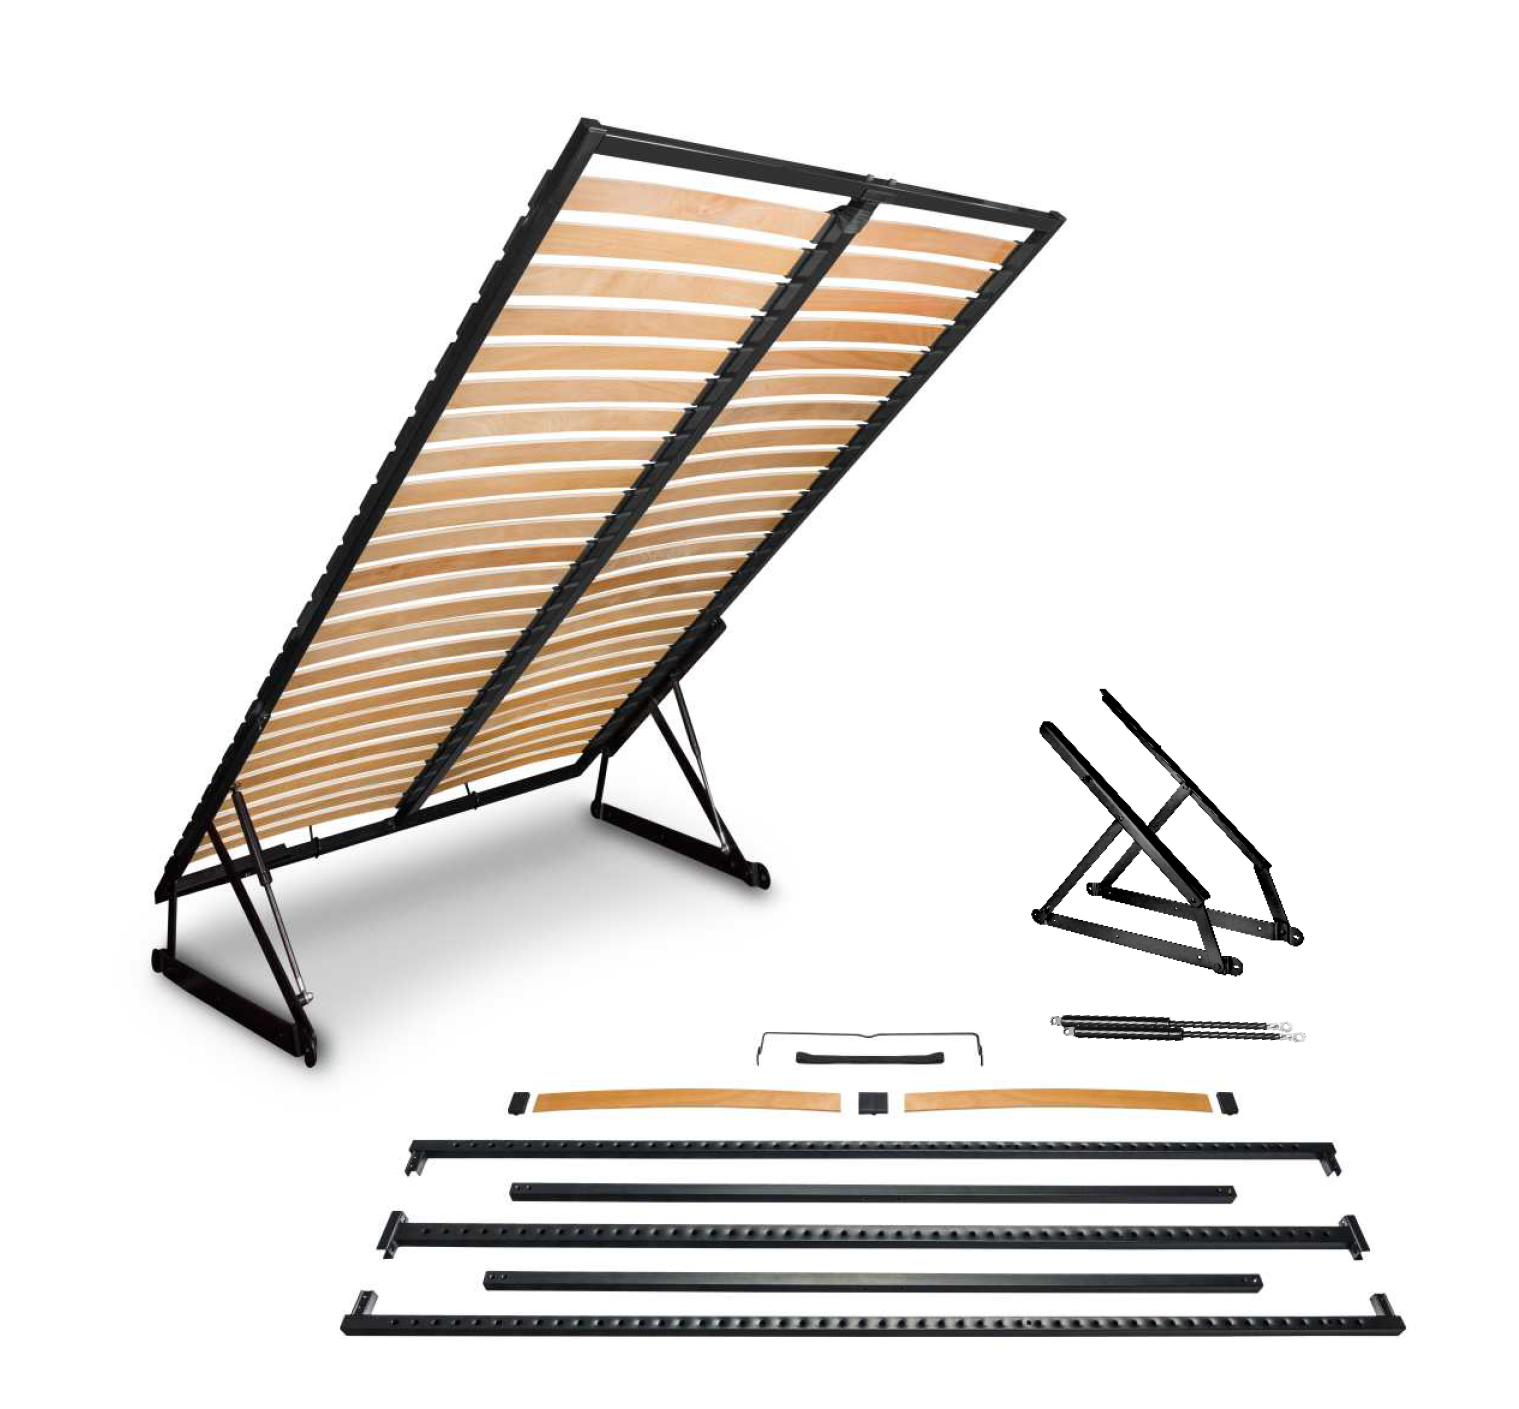 Lift Lattenrost  Bettkasten Lattenrahmen klappbar Heben Lattenrahmen für Bett